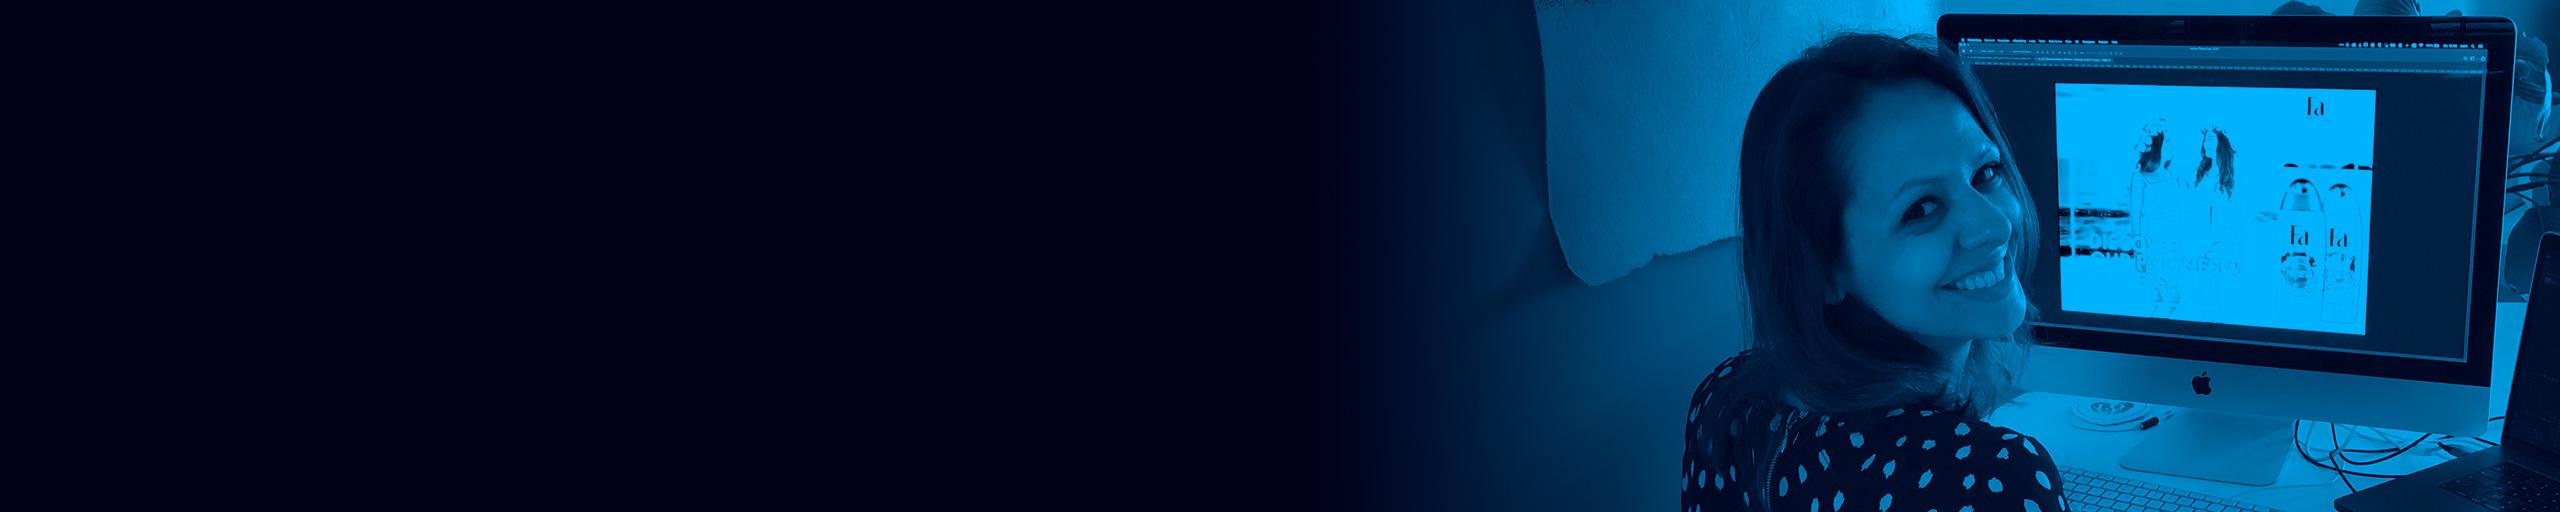 tiffany-blauw